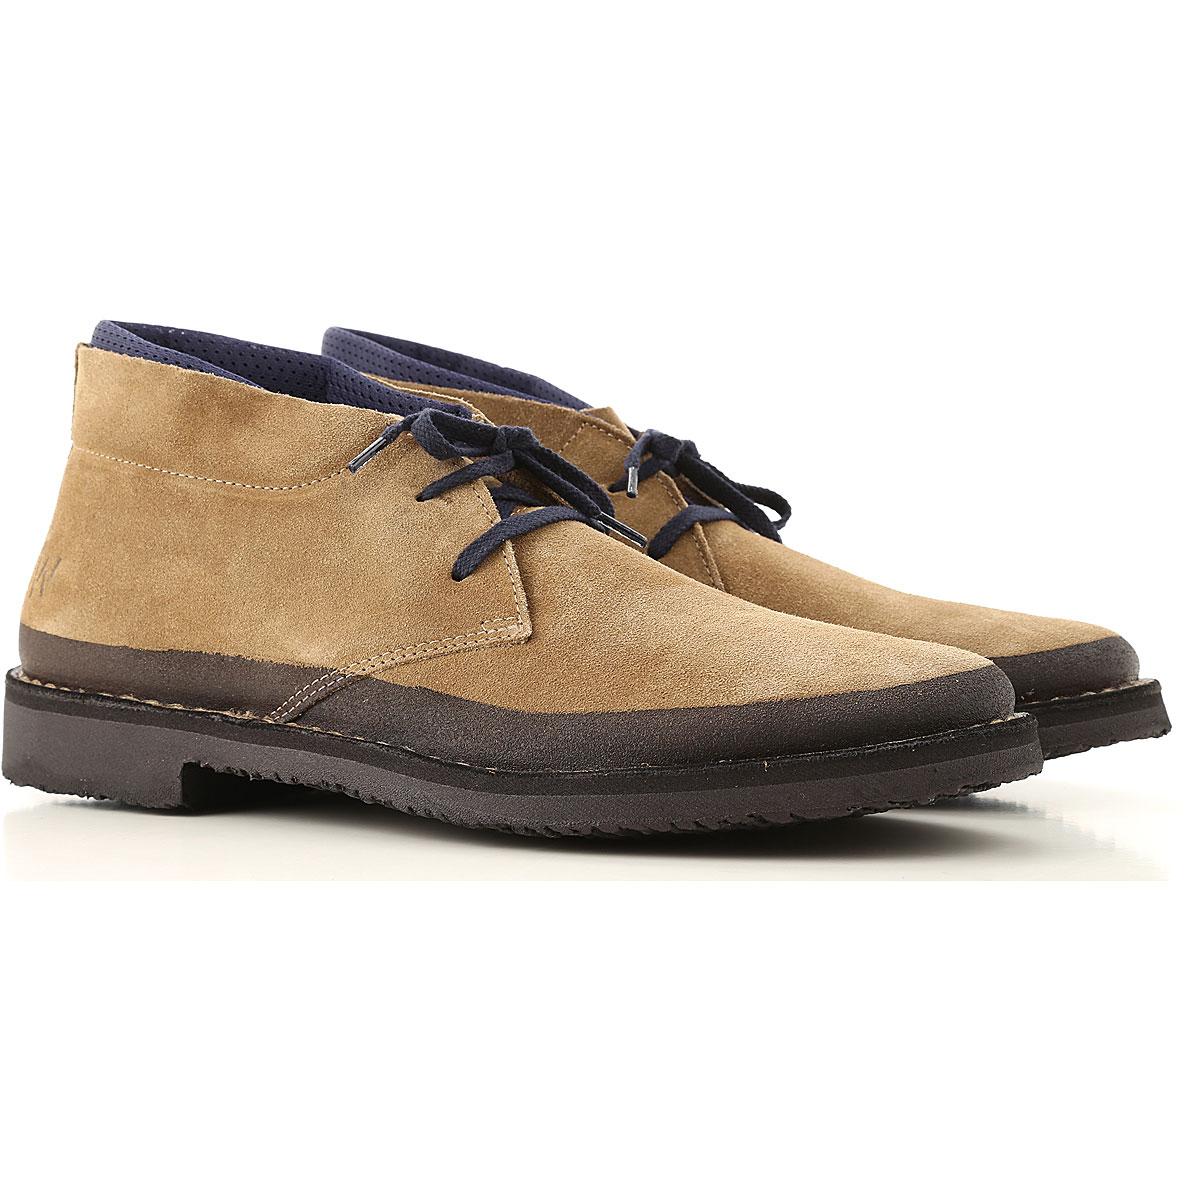 Wally Walker Desert Boots Chukka for Men On Sale, Beige, Suede leather, 2019, 10 10.5 7.5